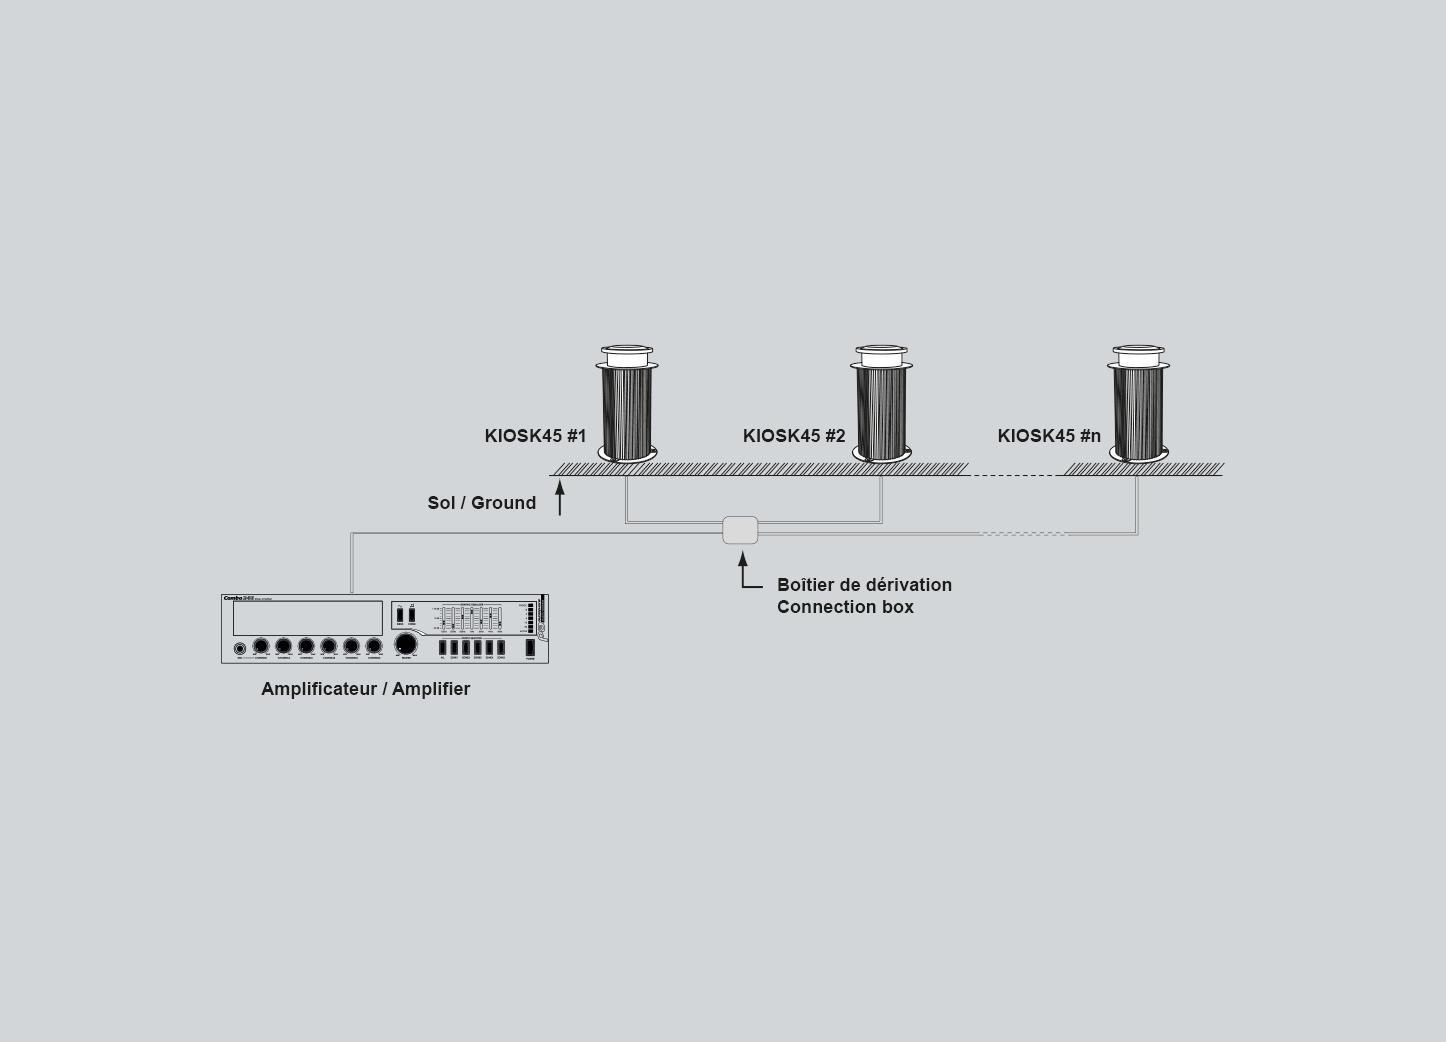 Configuration du KIOSK45